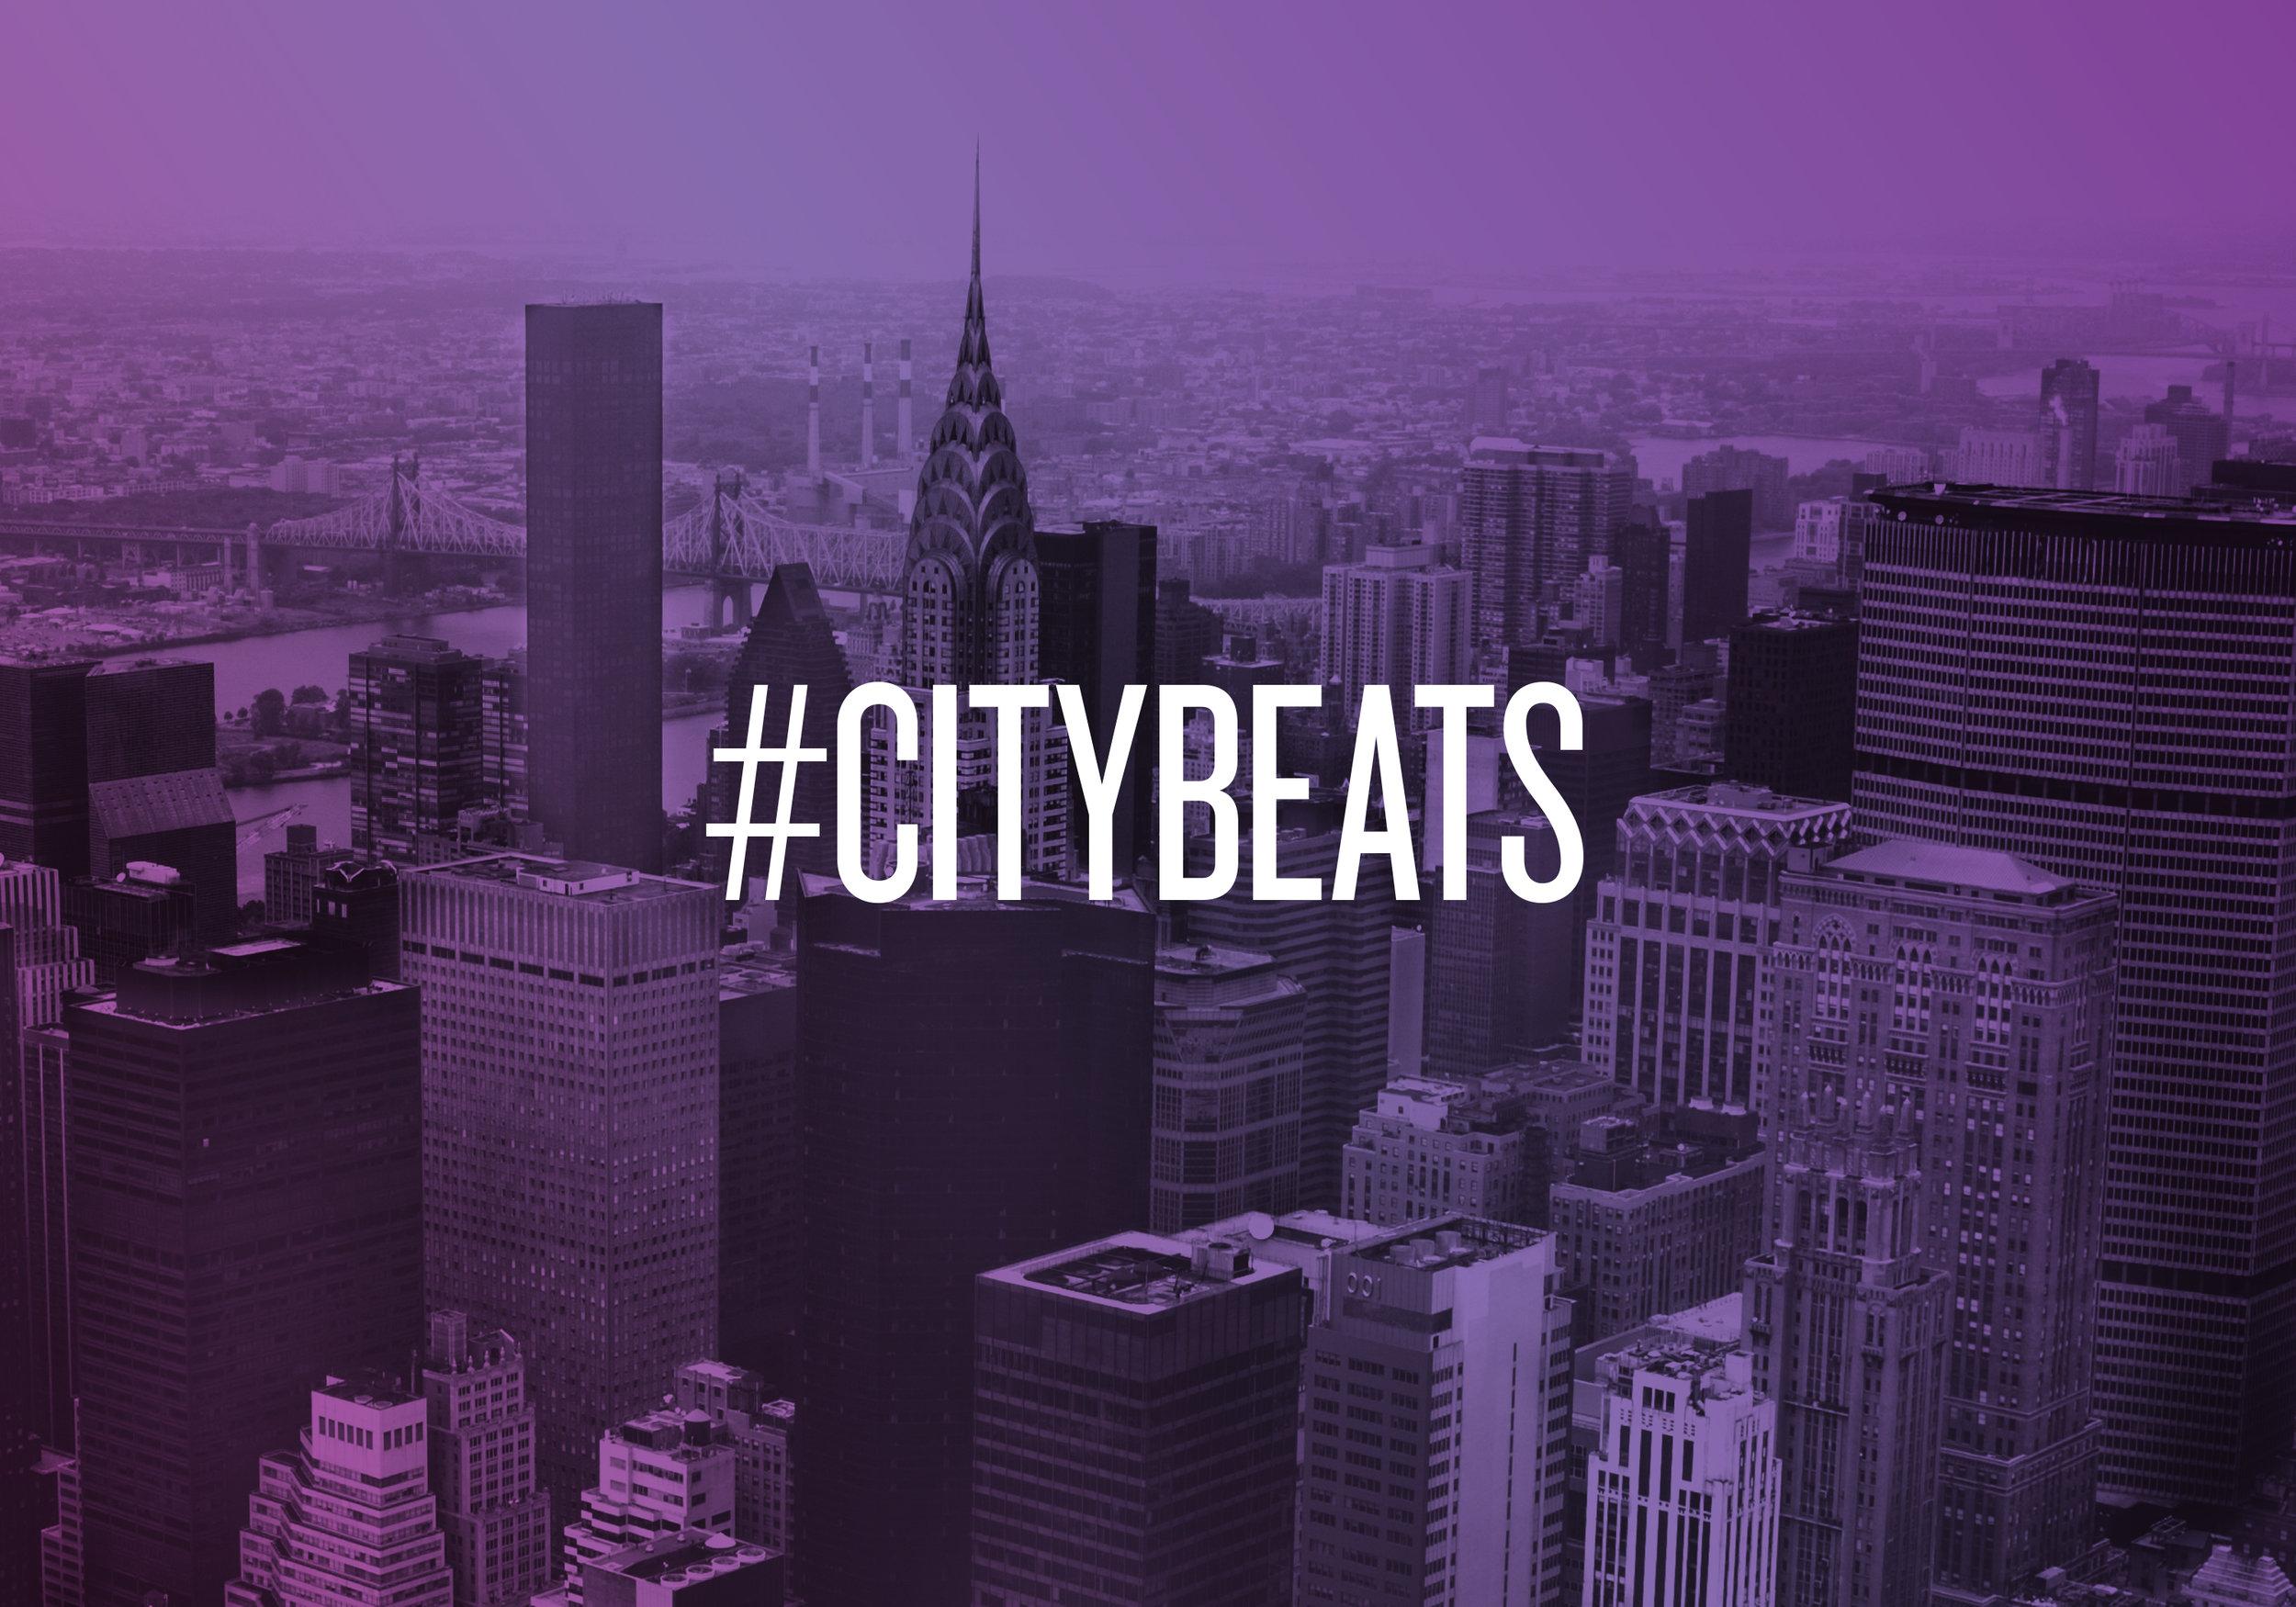 Redken-NA-2018-City-Beats-Electric-Orchid-Jet-Black-Stylist-Guide-13.jpg